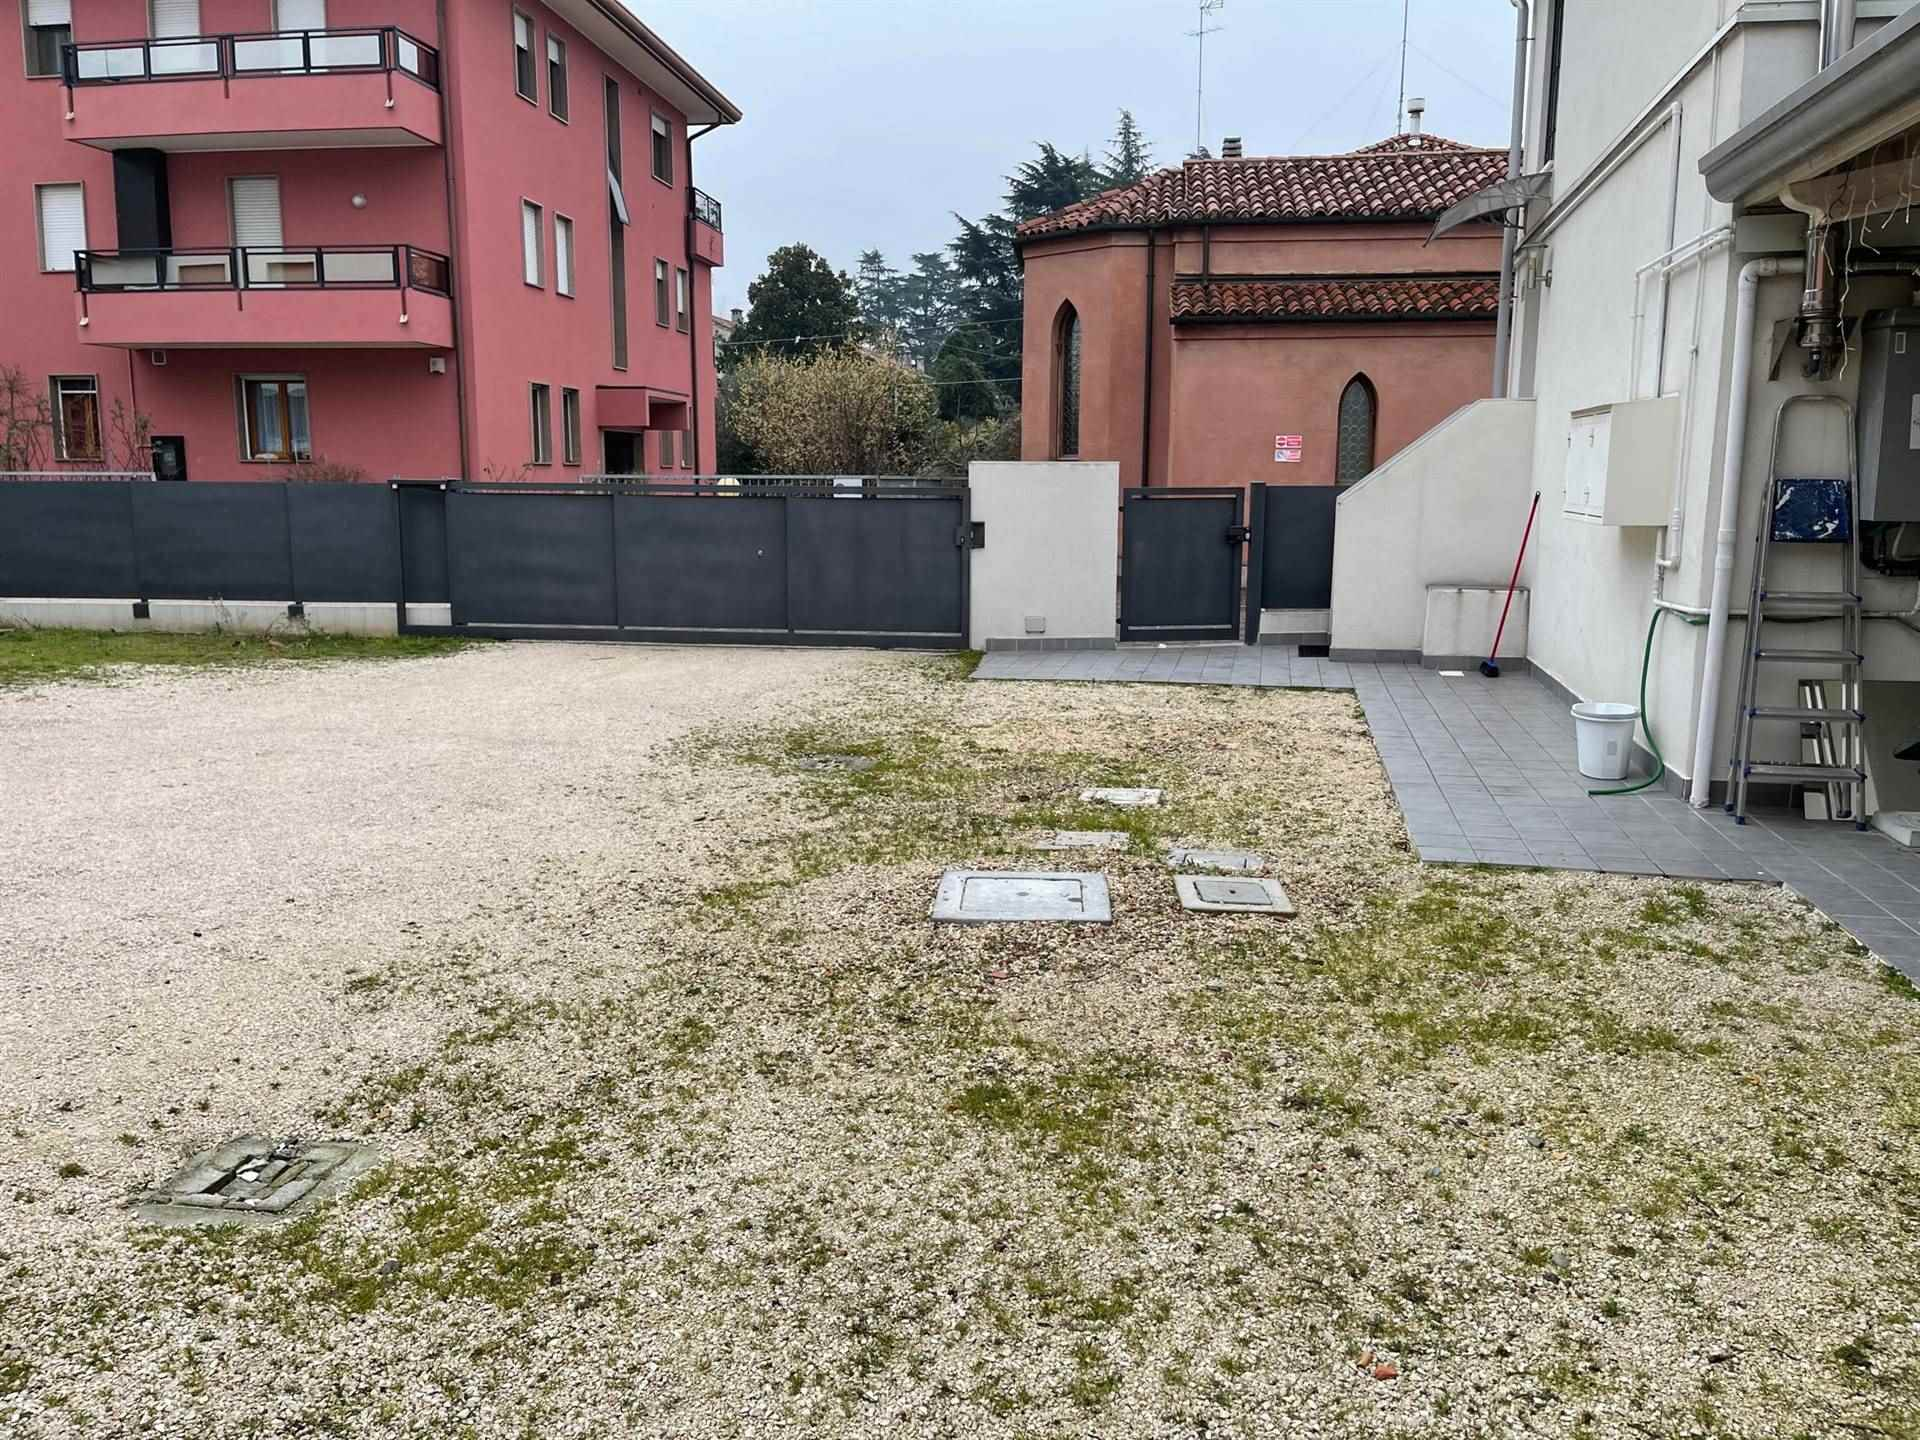 giardino condominiale con posti auto Mestre